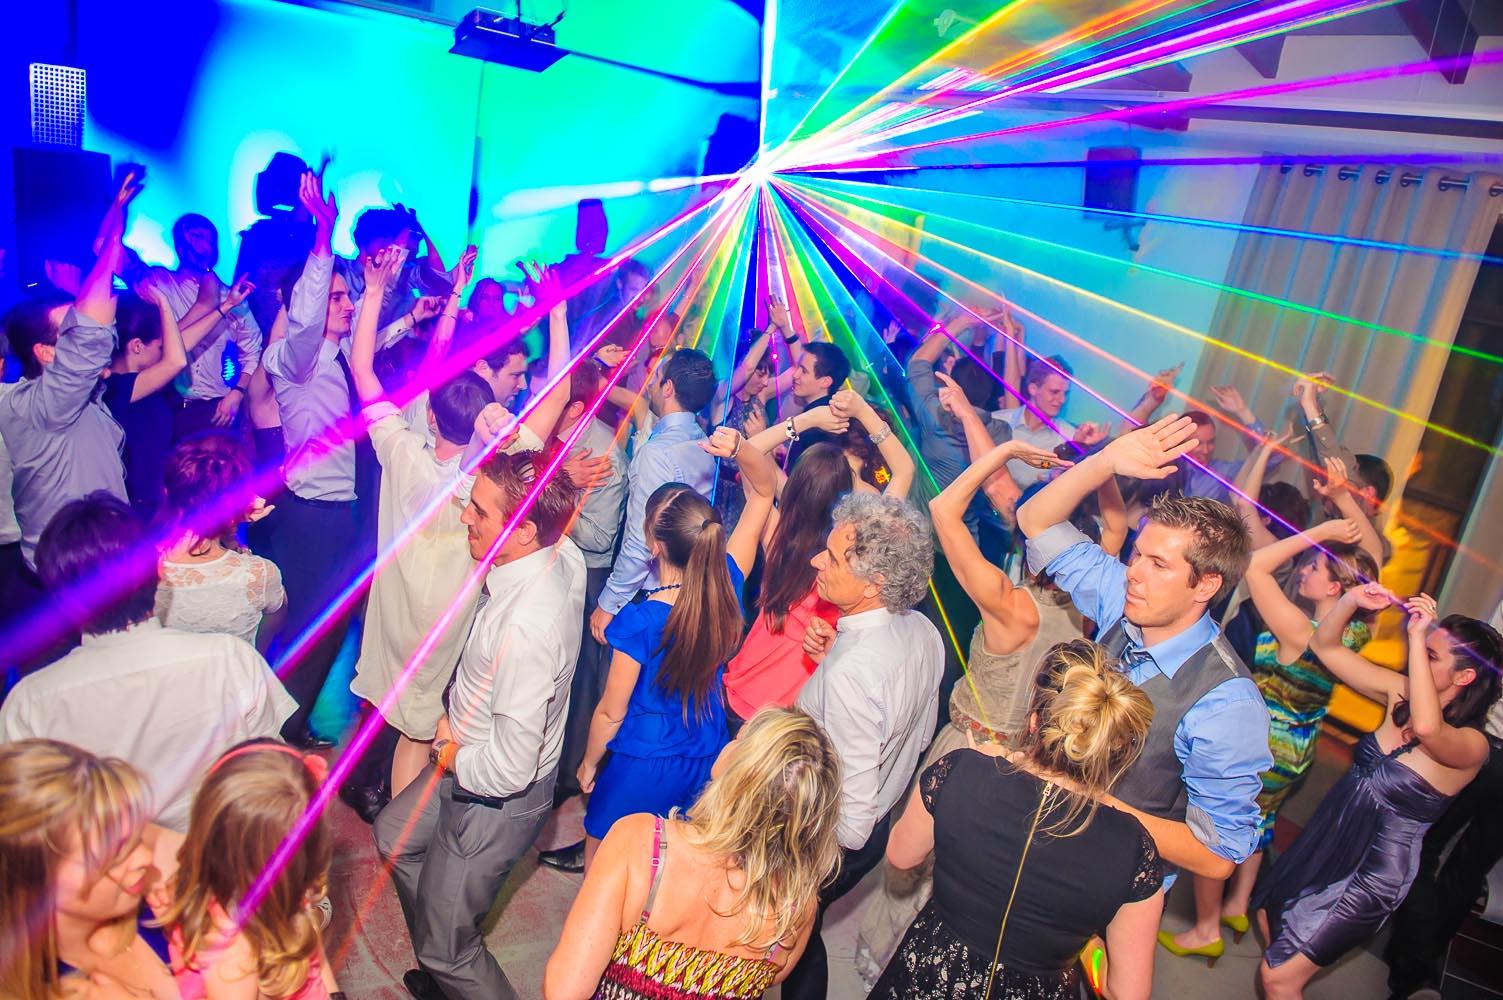 Danse laser